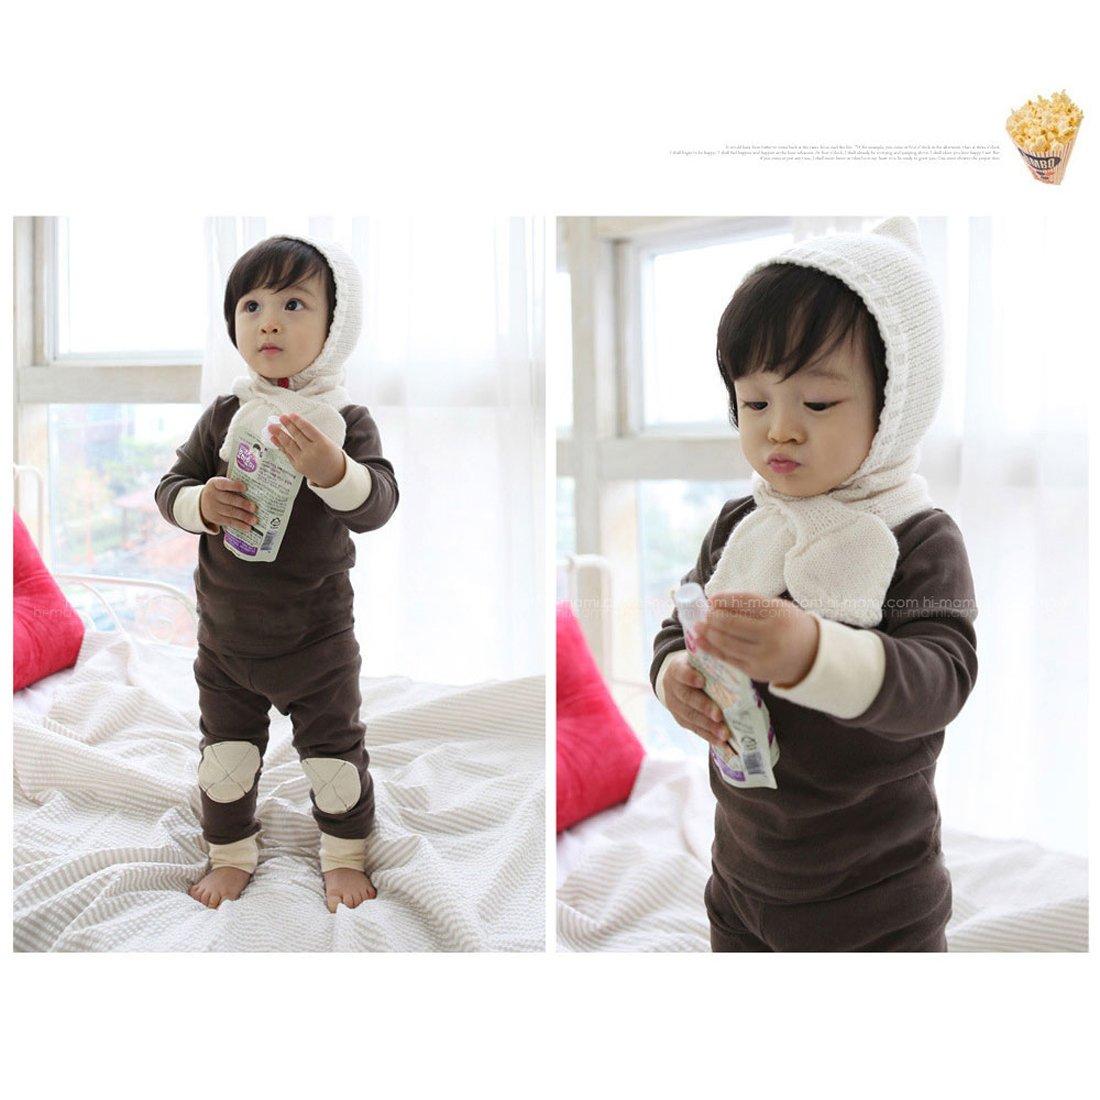 Gaorui Baby Toddler Girls Winter Pyjamas Set Fleece Lined Long Sleeve Thermal Underwear Casual Tracksuit Clothing Set